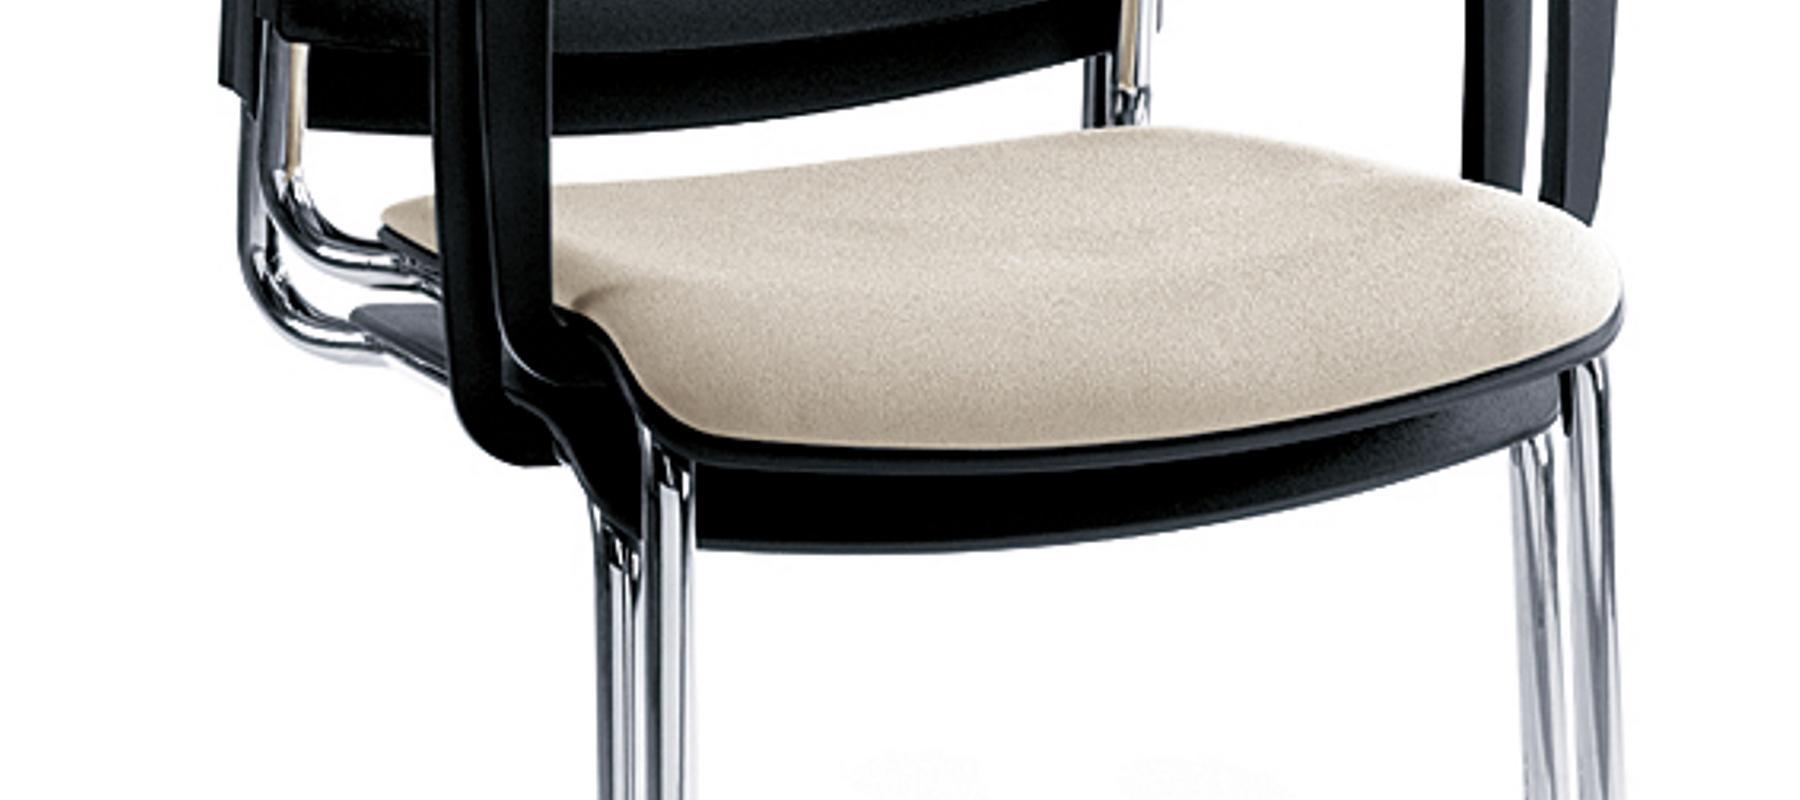 krzesła konferencyjne bit detale - 02